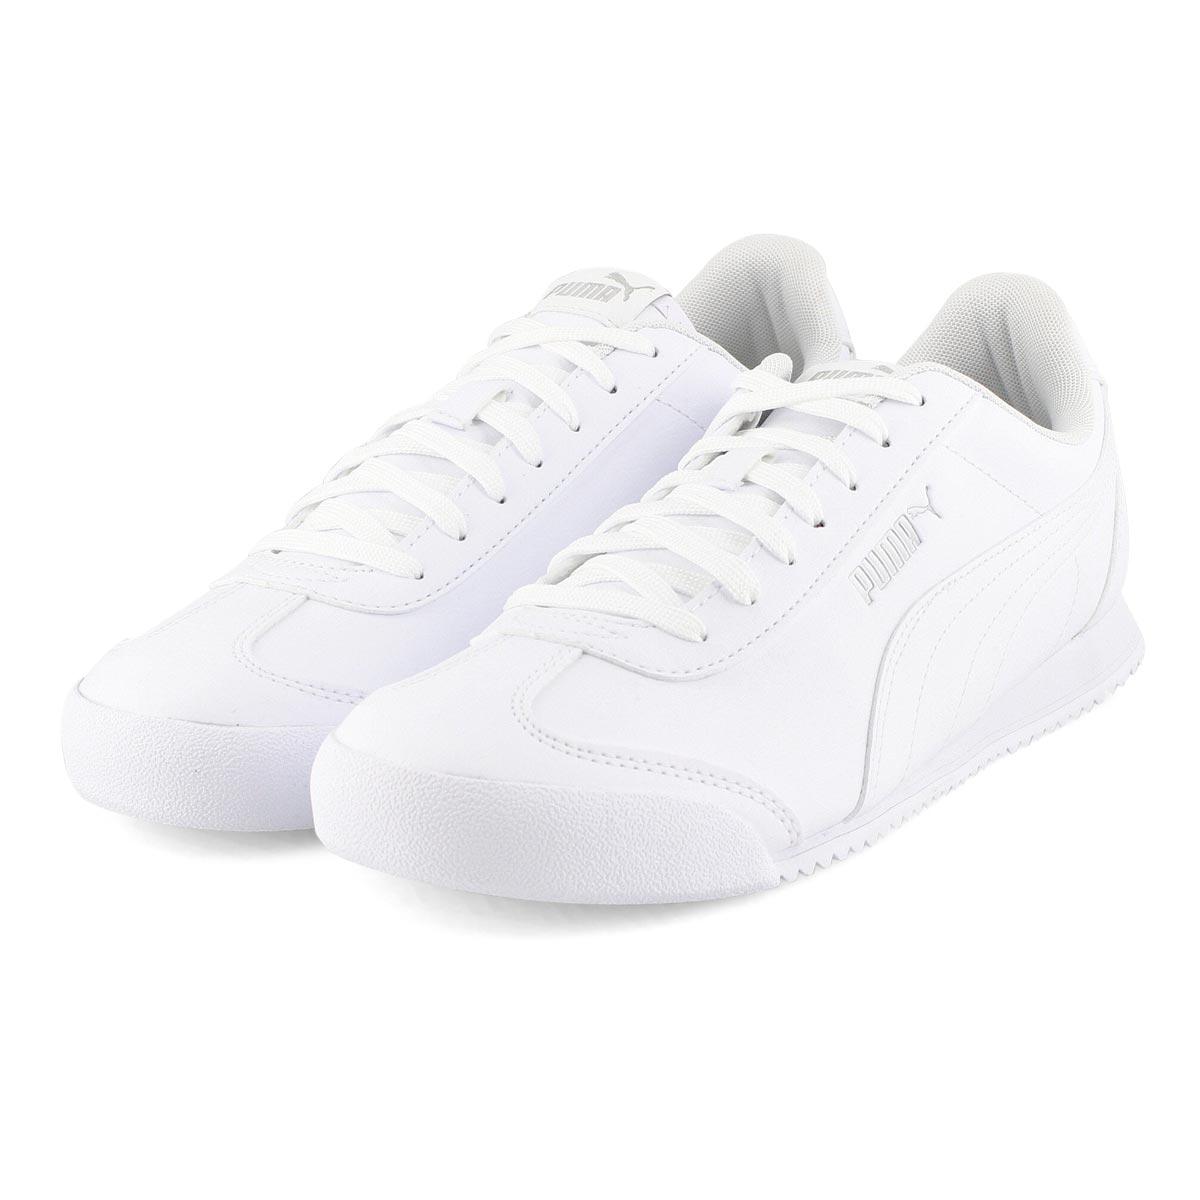 Mns Turino FSL wht/wht fashion sneaker